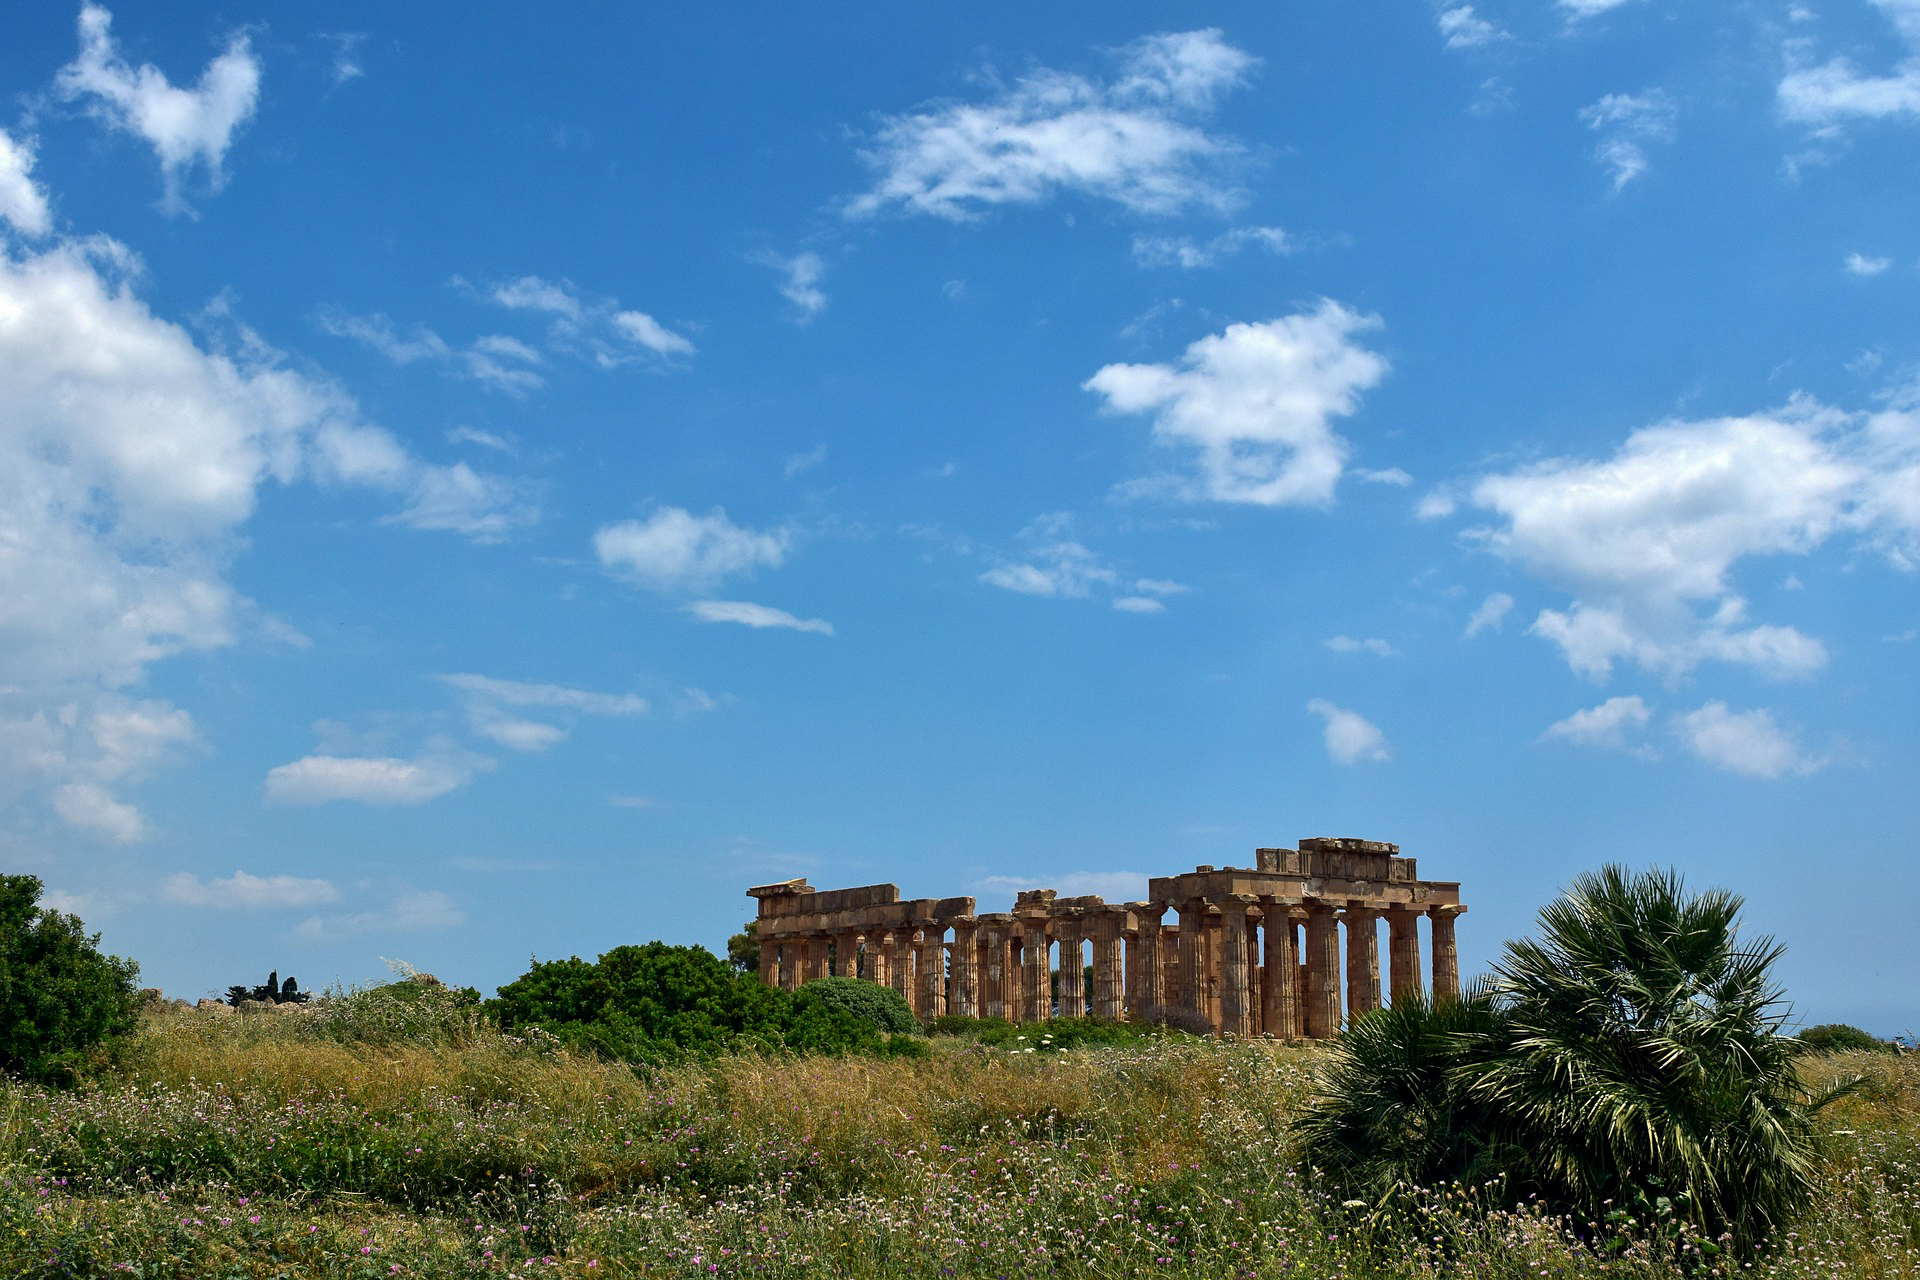 Selinunt auf der Insel Sizilien